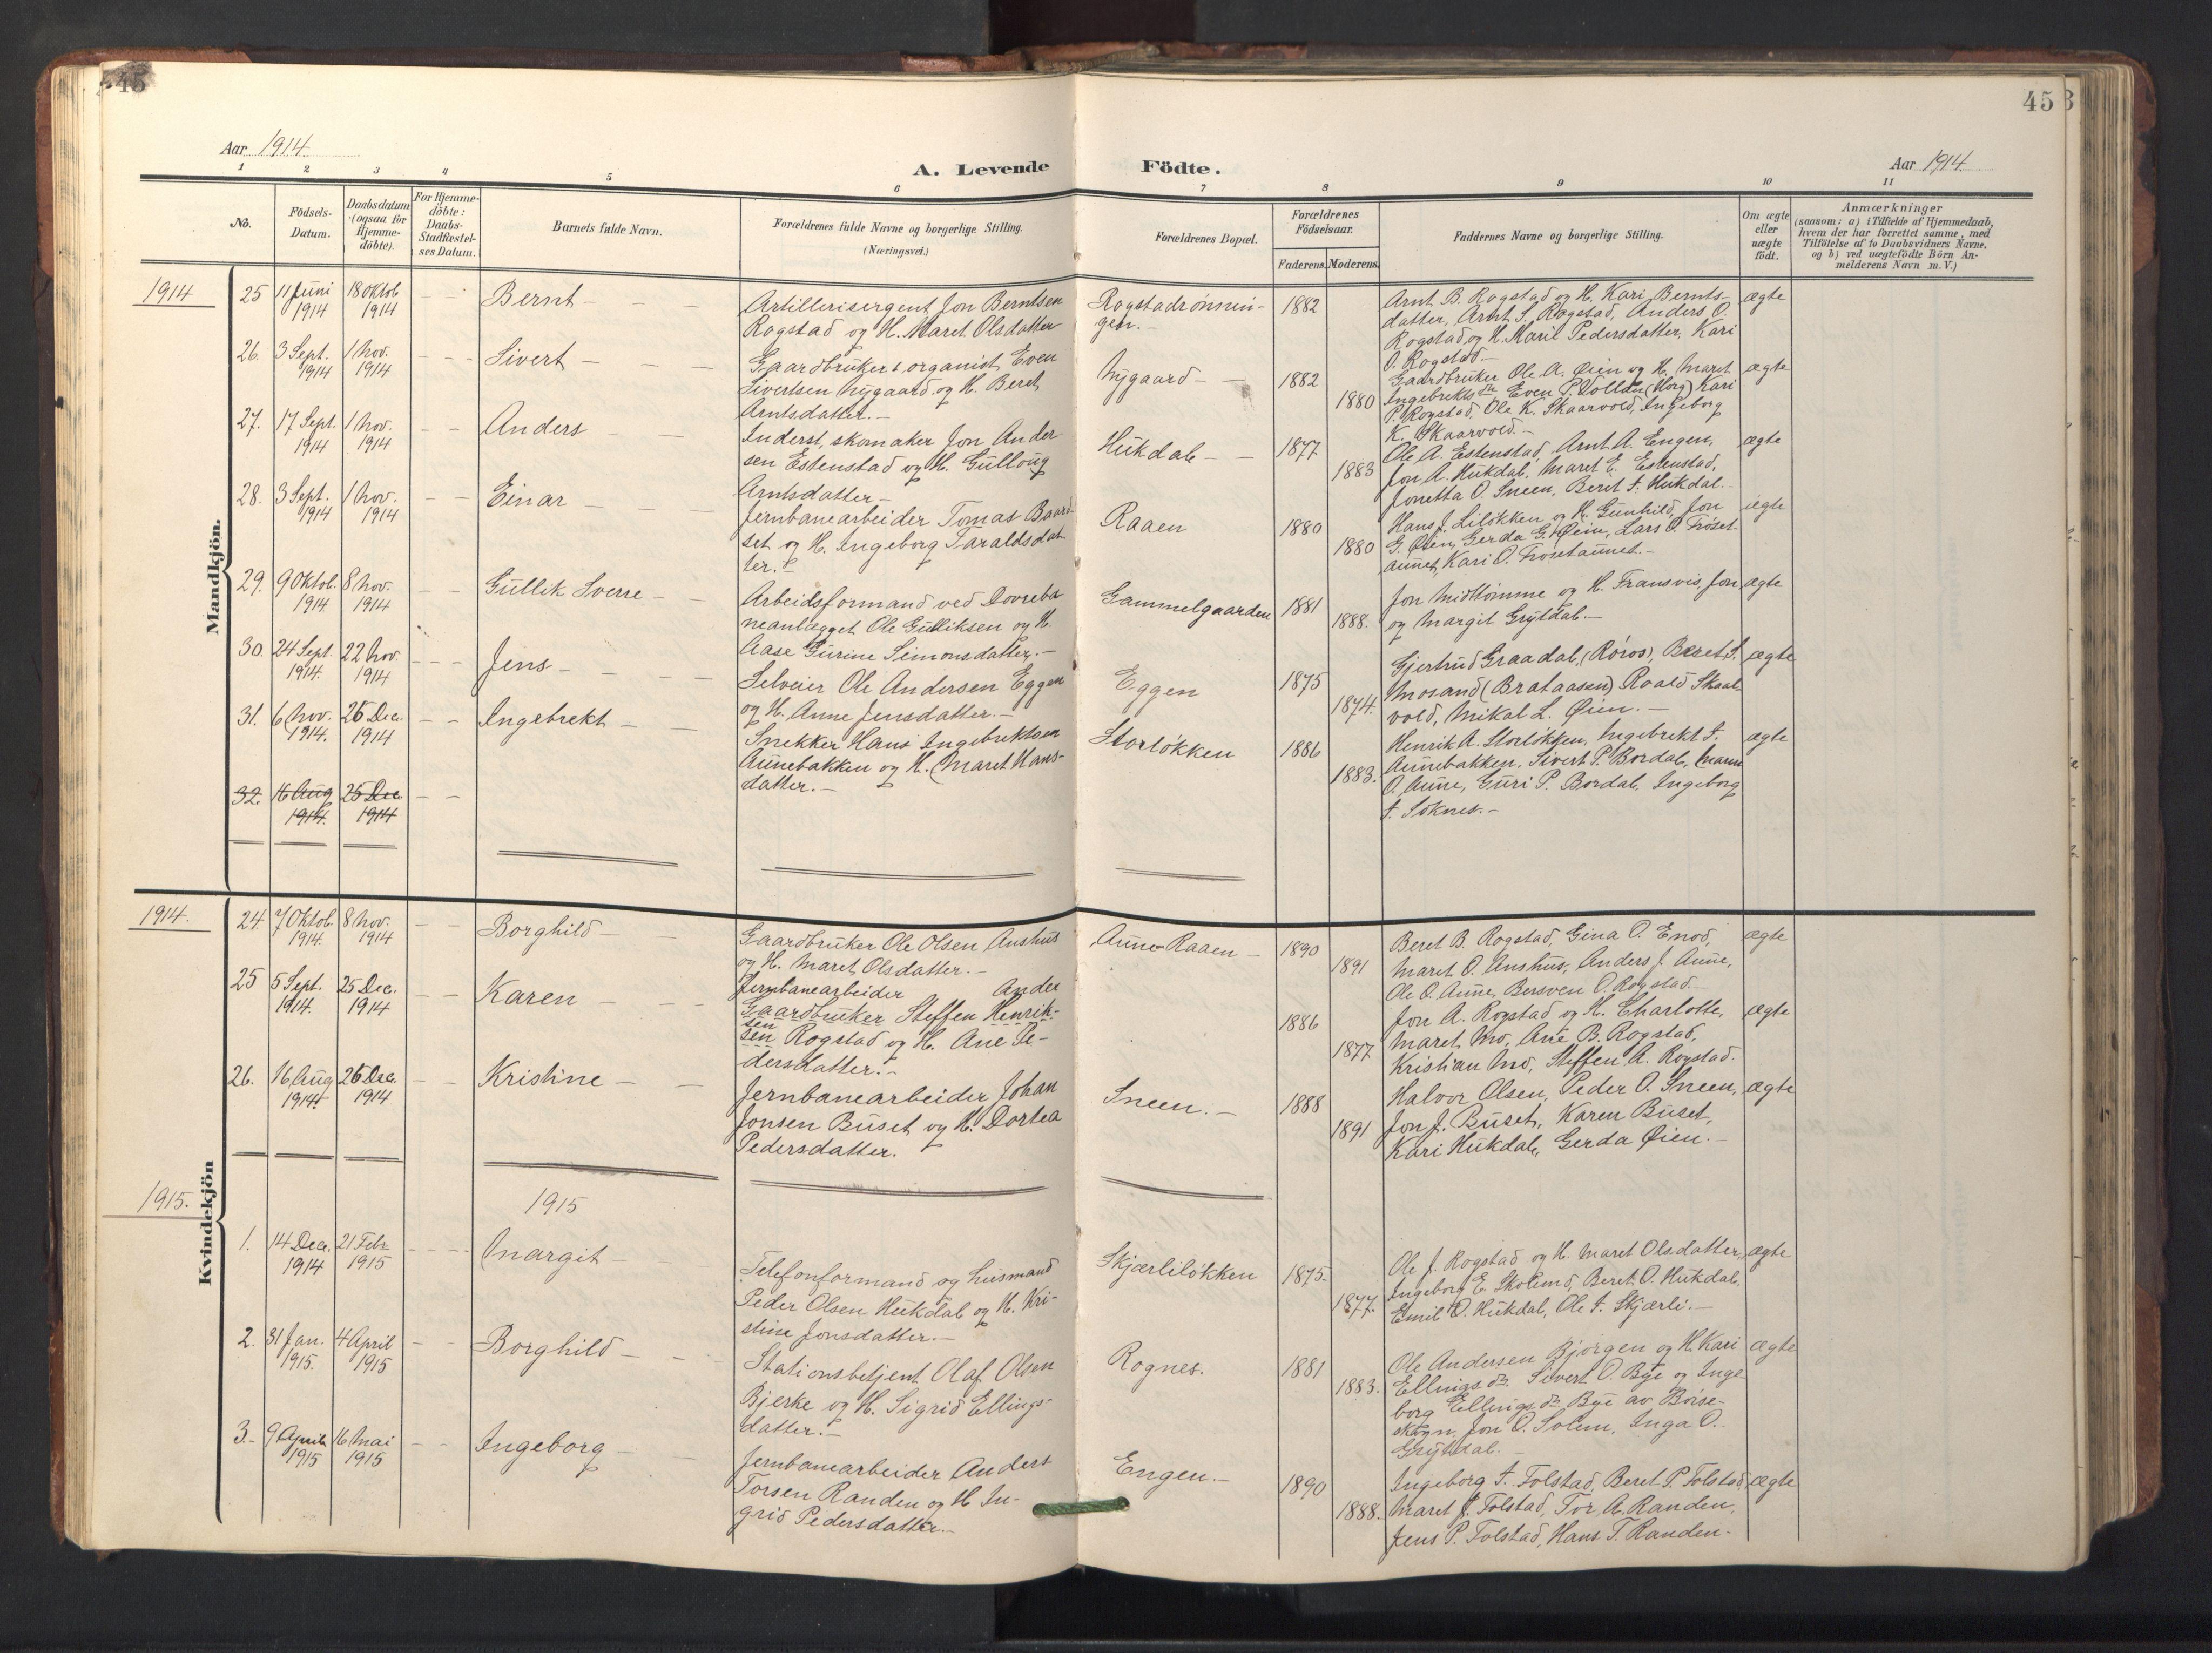 SAT, Ministerialprotokoller, klokkerbøker og fødselsregistre - Sør-Trøndelag, 687/L1019: Parish register (copy) no. 687C03, 1904-1931, p. 45